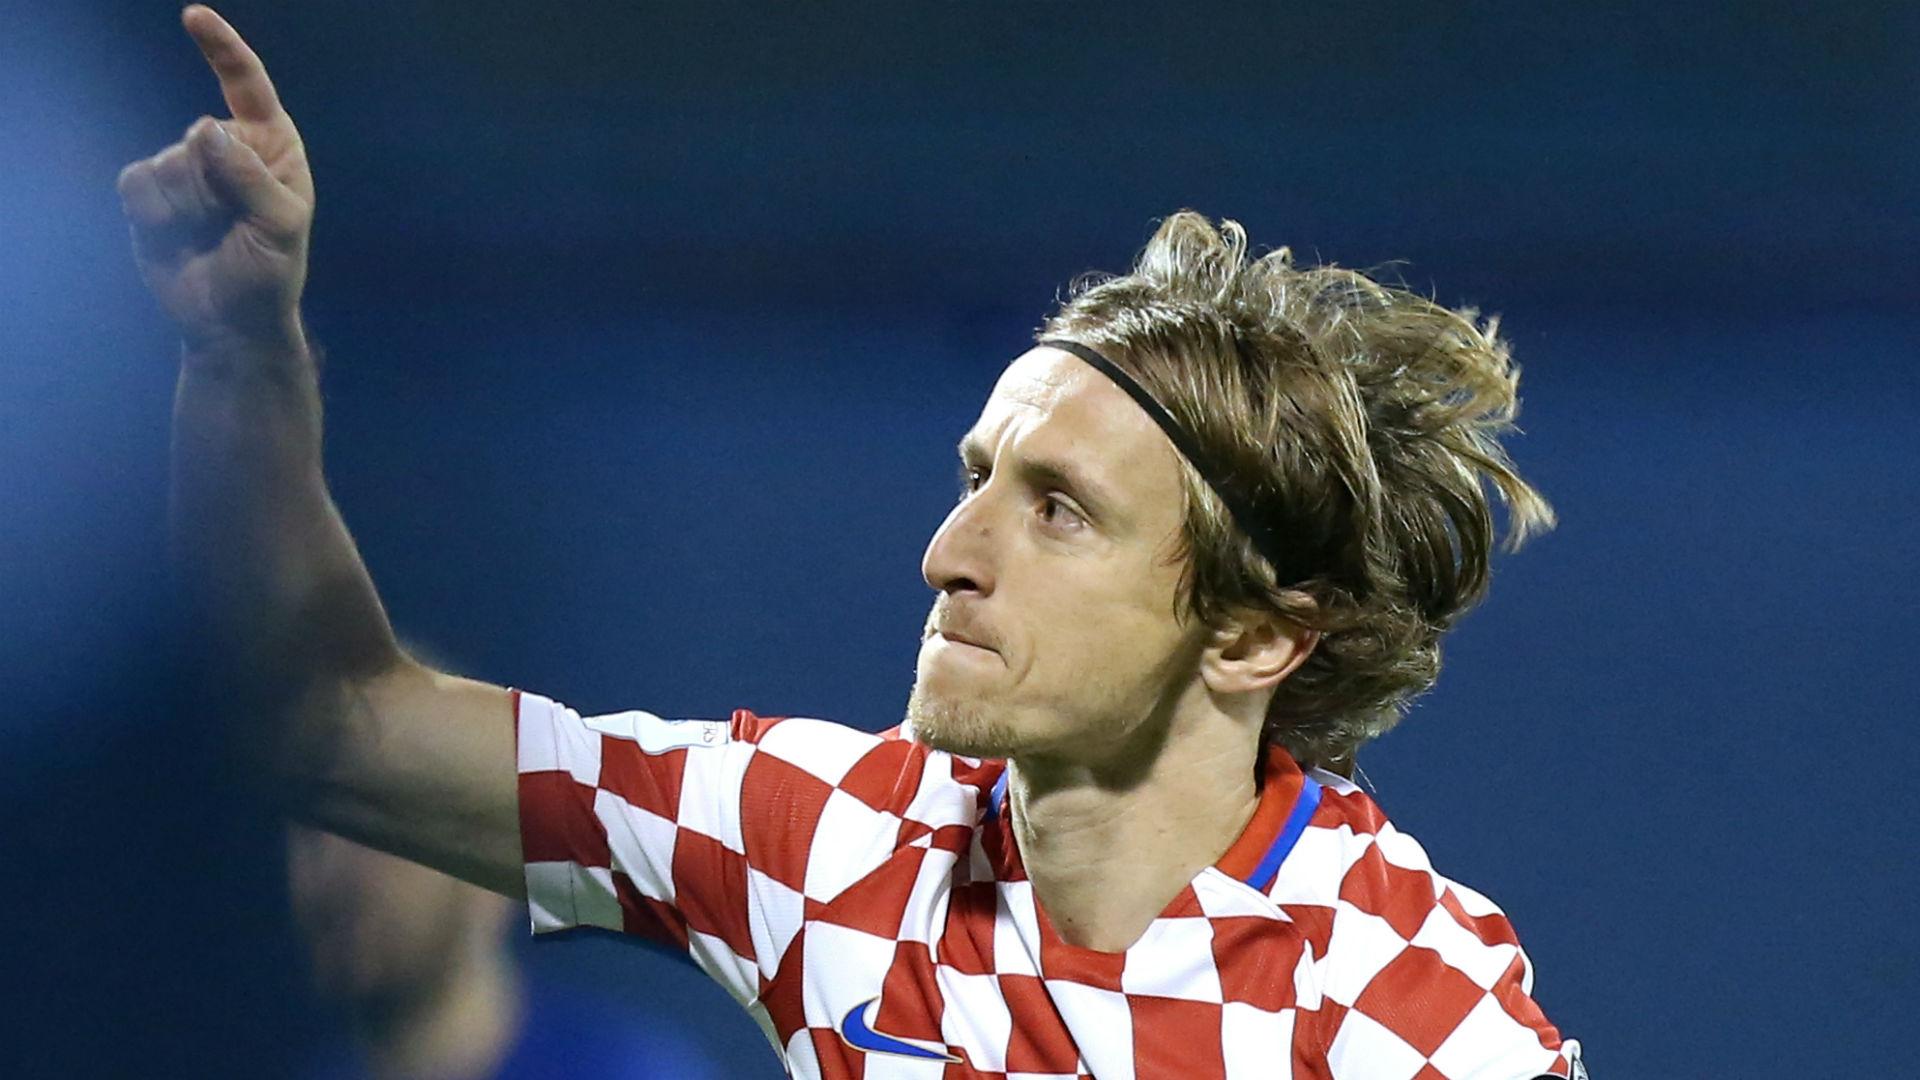 Croatia Greece WC Qualification 09112017 Modric